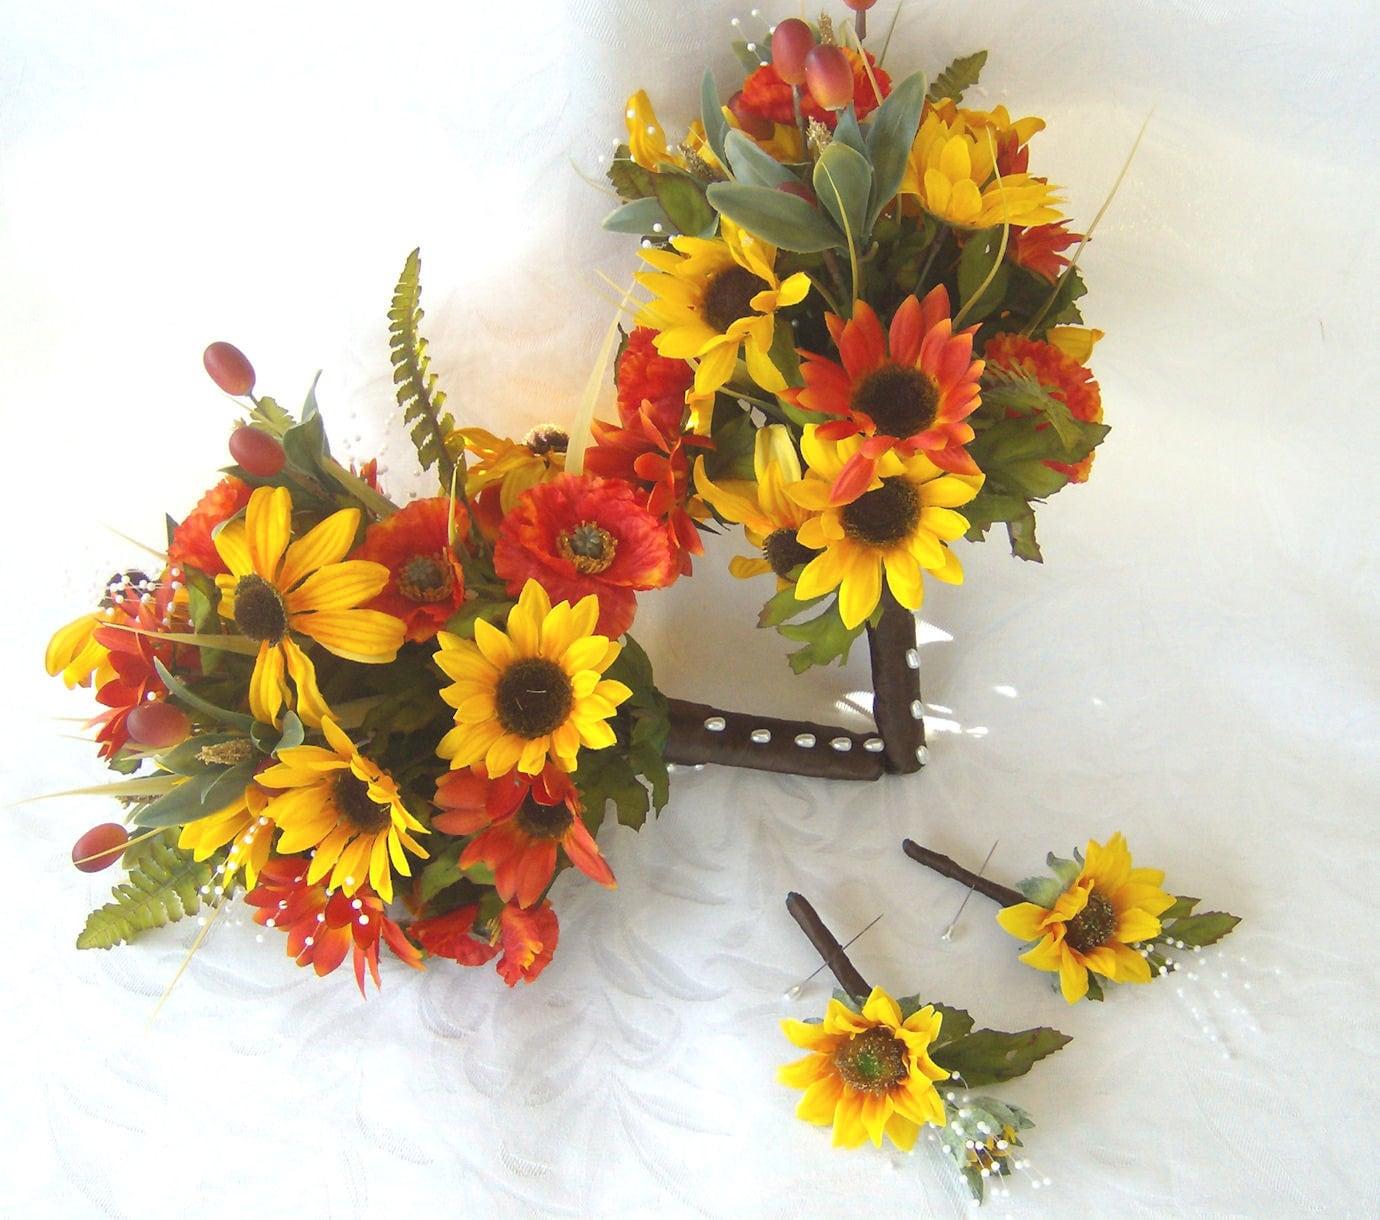 Sunflower Wedding Bouquet Ideas: Sunflower Bridal Bouquet Sunflowers Black Eyed Susan Poppies